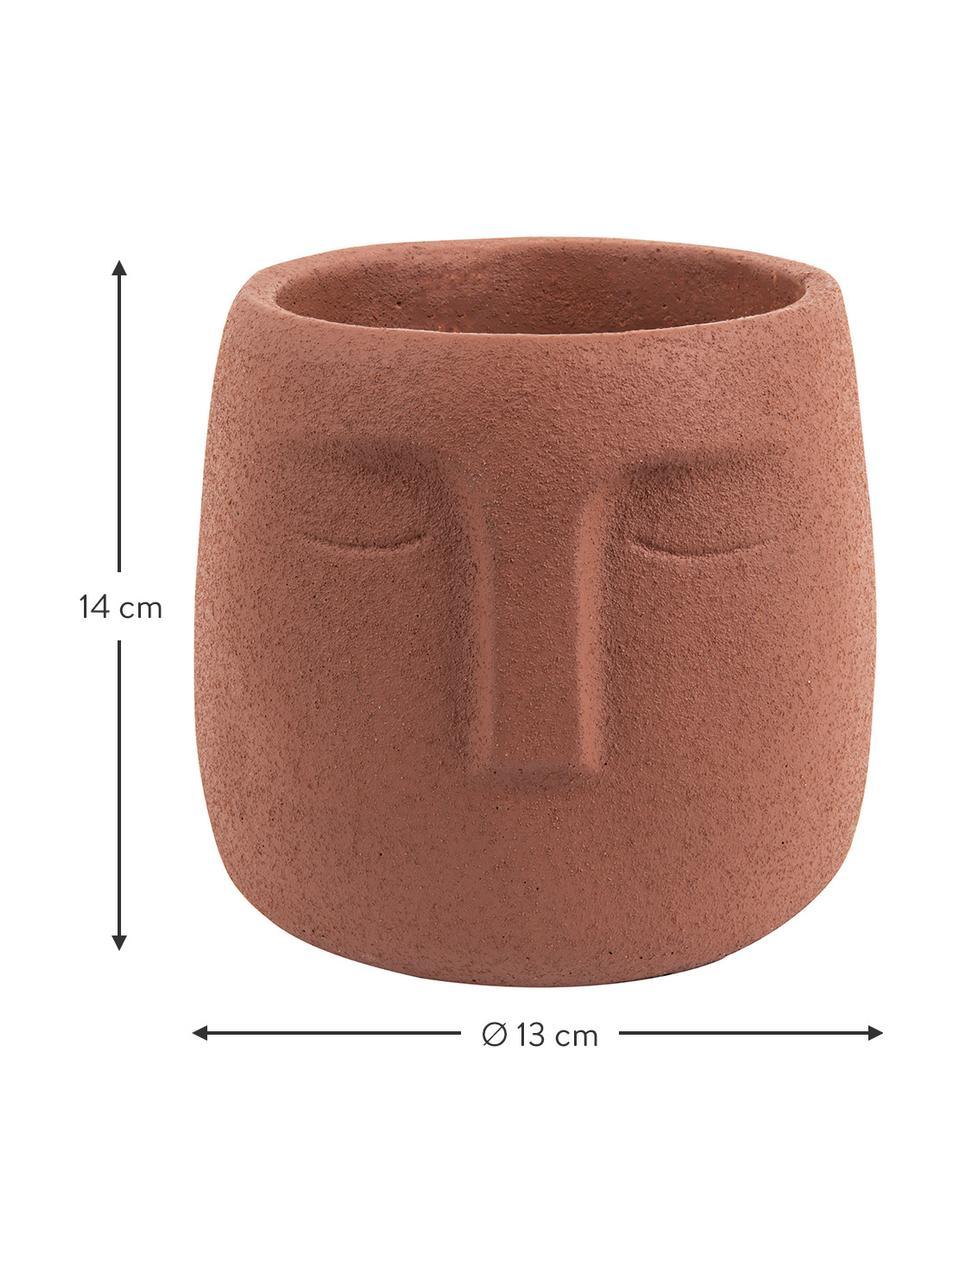 Plantenpot  Face van keramiek, Keramiek, Bruin, Ø 13 x H 14 cm